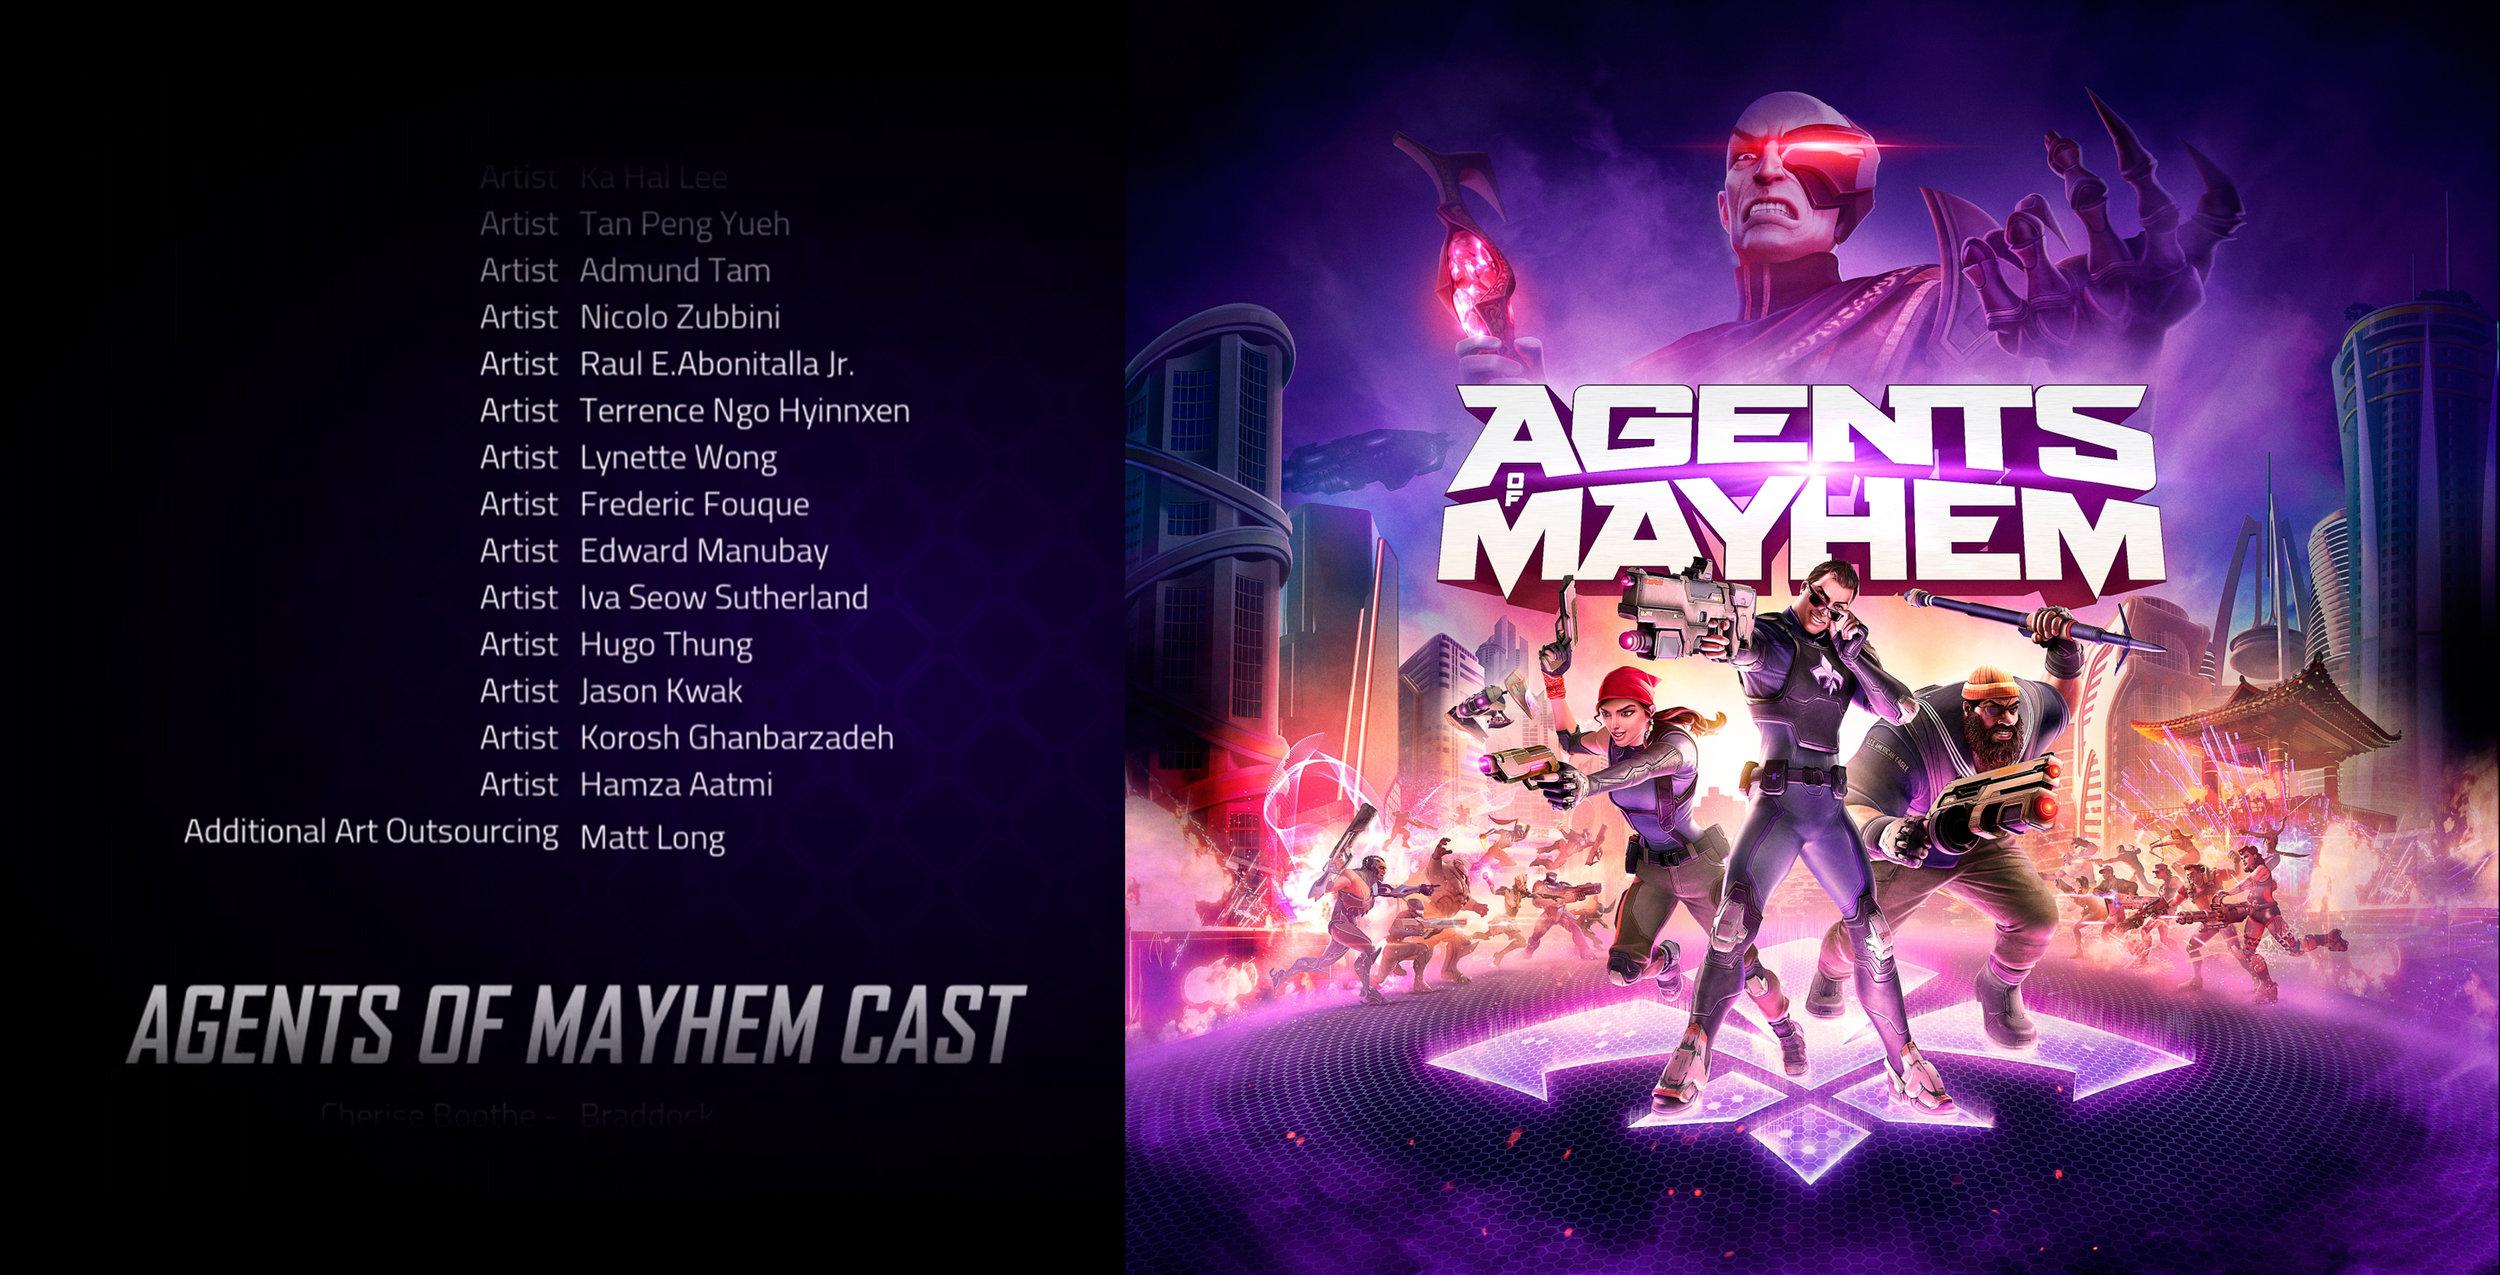 agents_credits_s.jpg